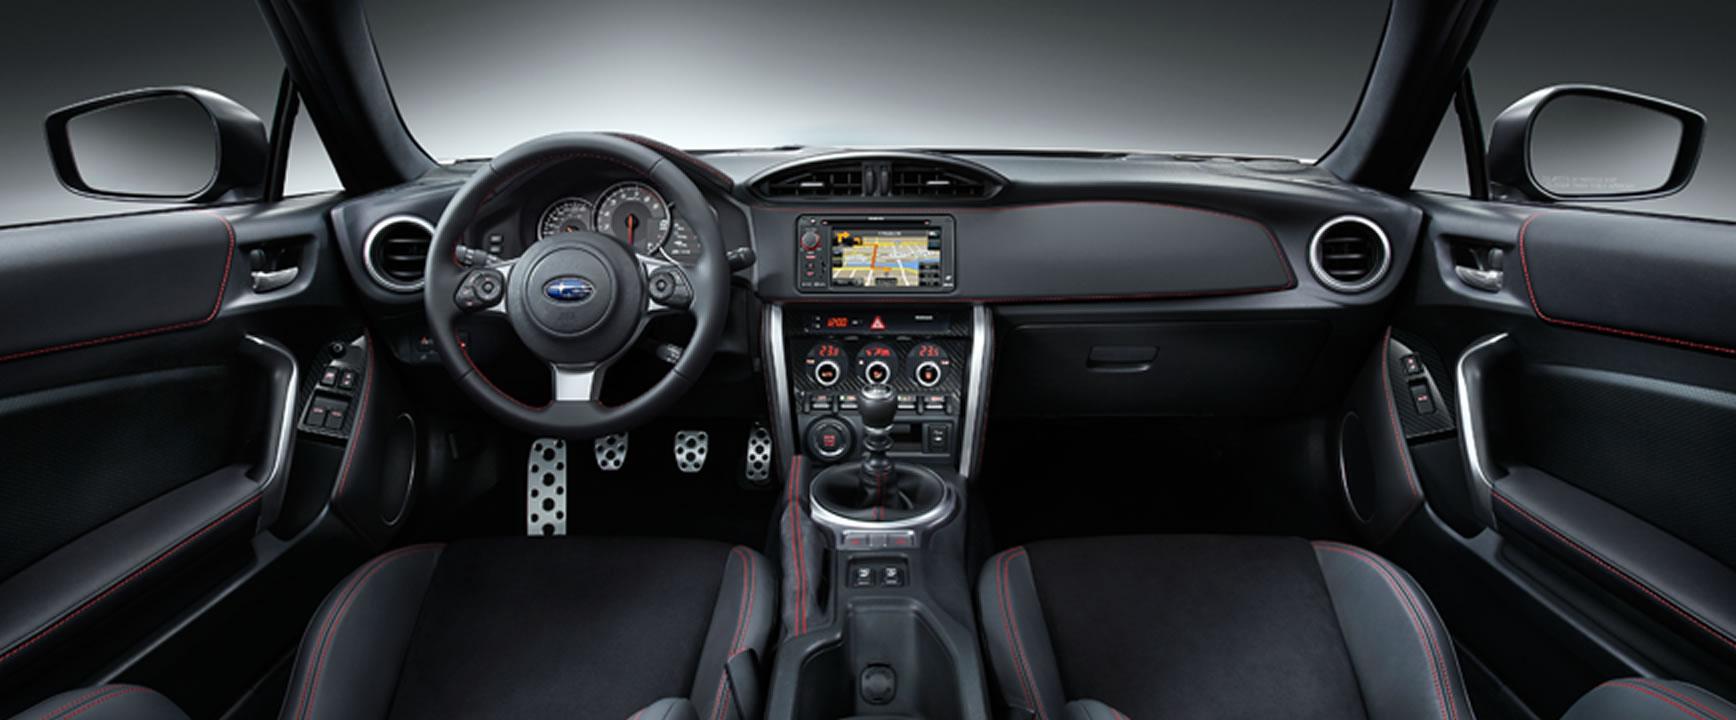 Custom car interior queens ny - Interior 2017 Brz Subaru Canada